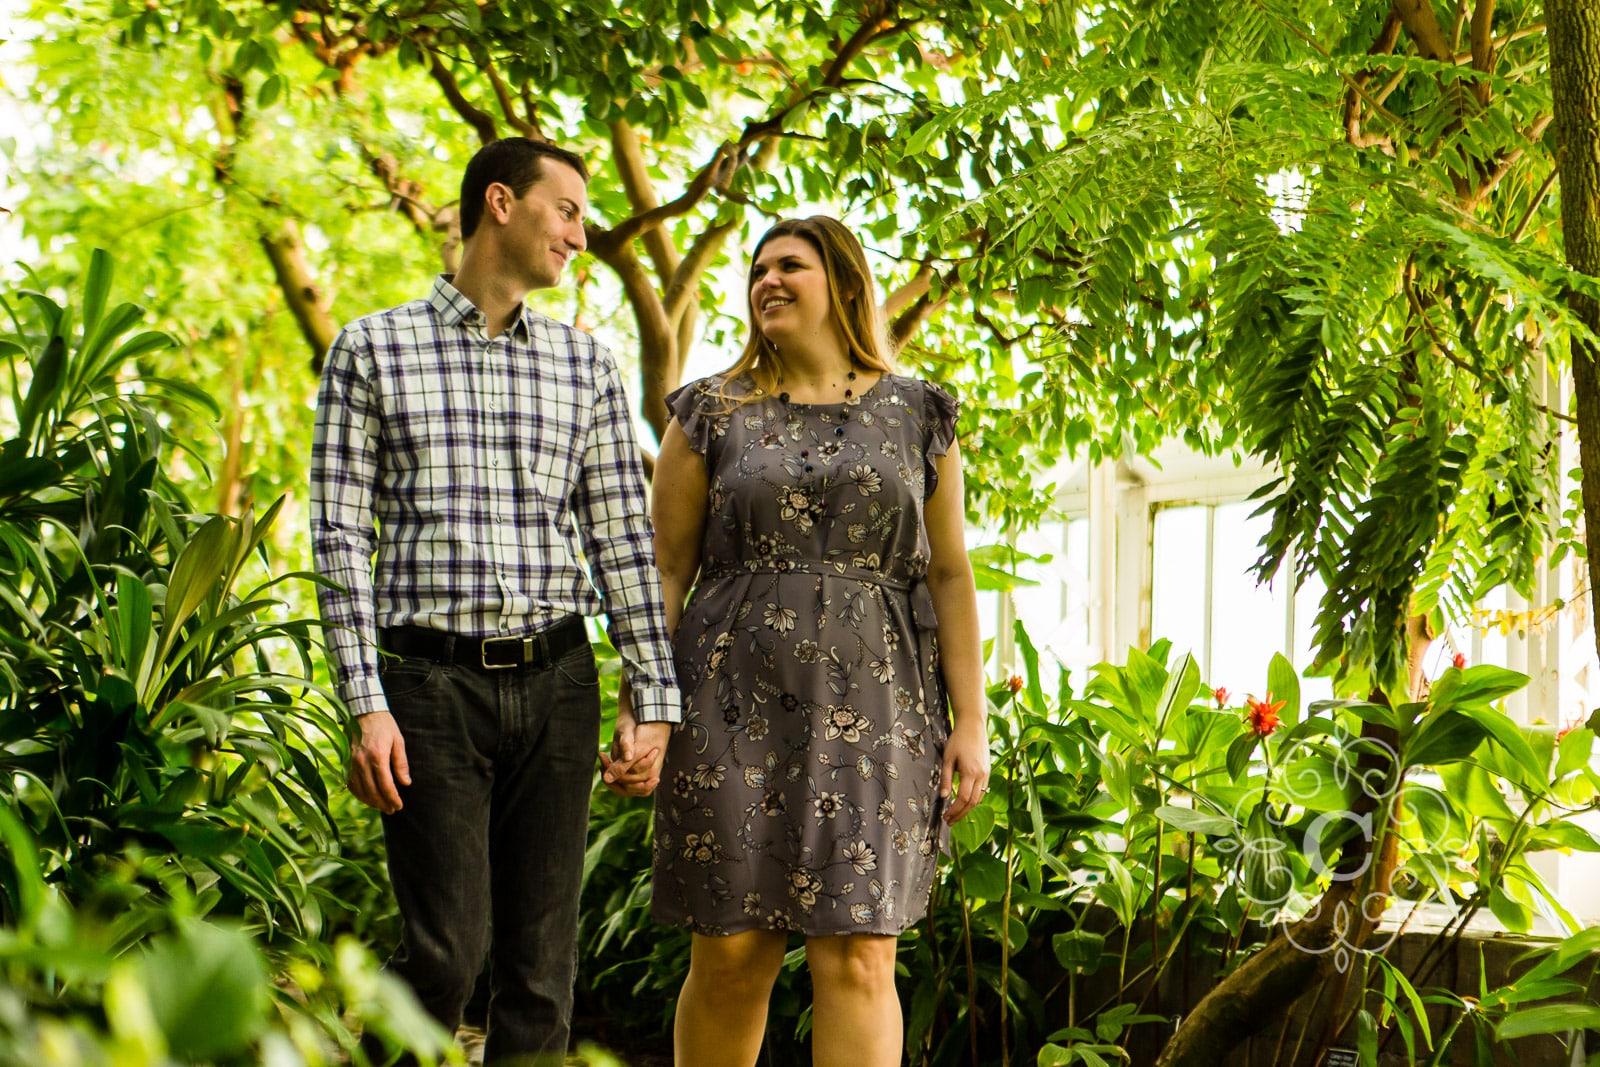 North Garden Como Conservatory Engagement Photo